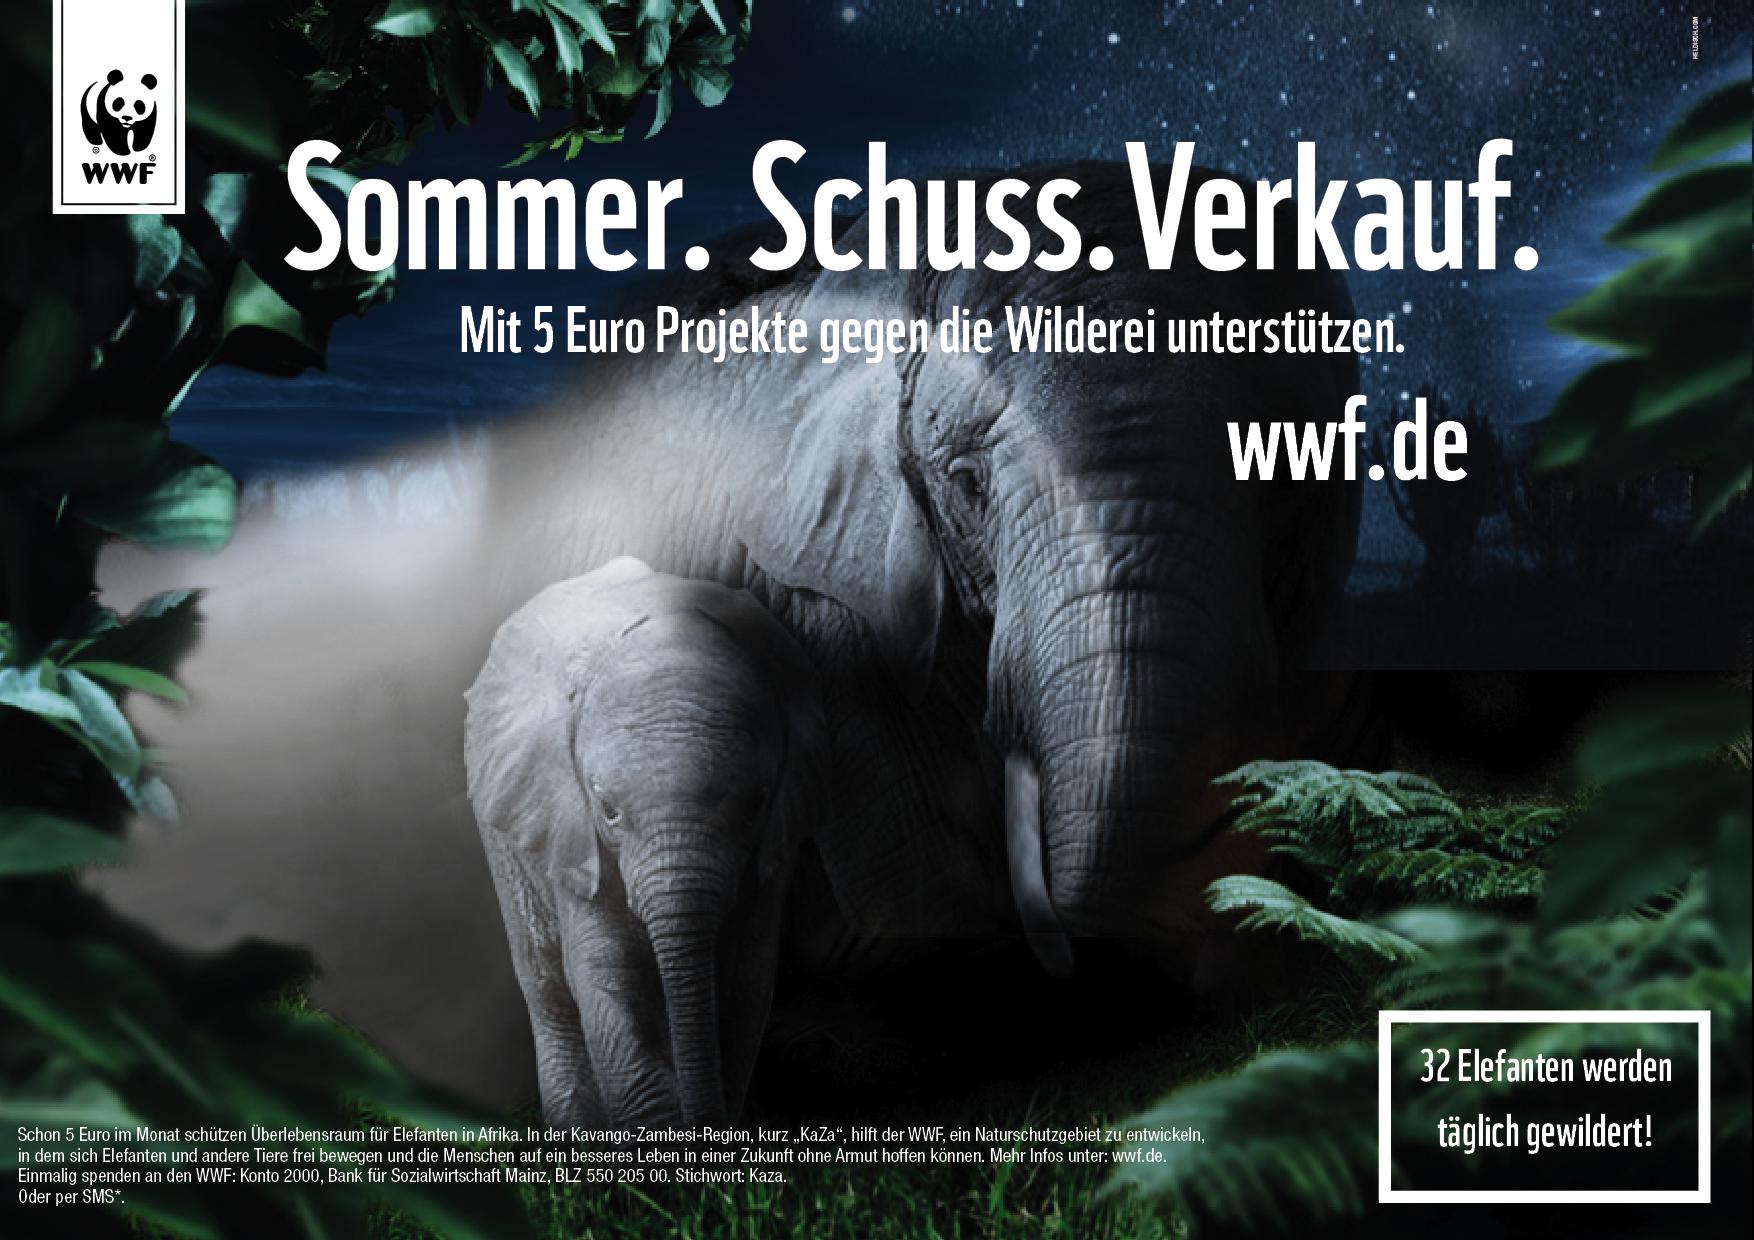 WWF_Bilder32_o